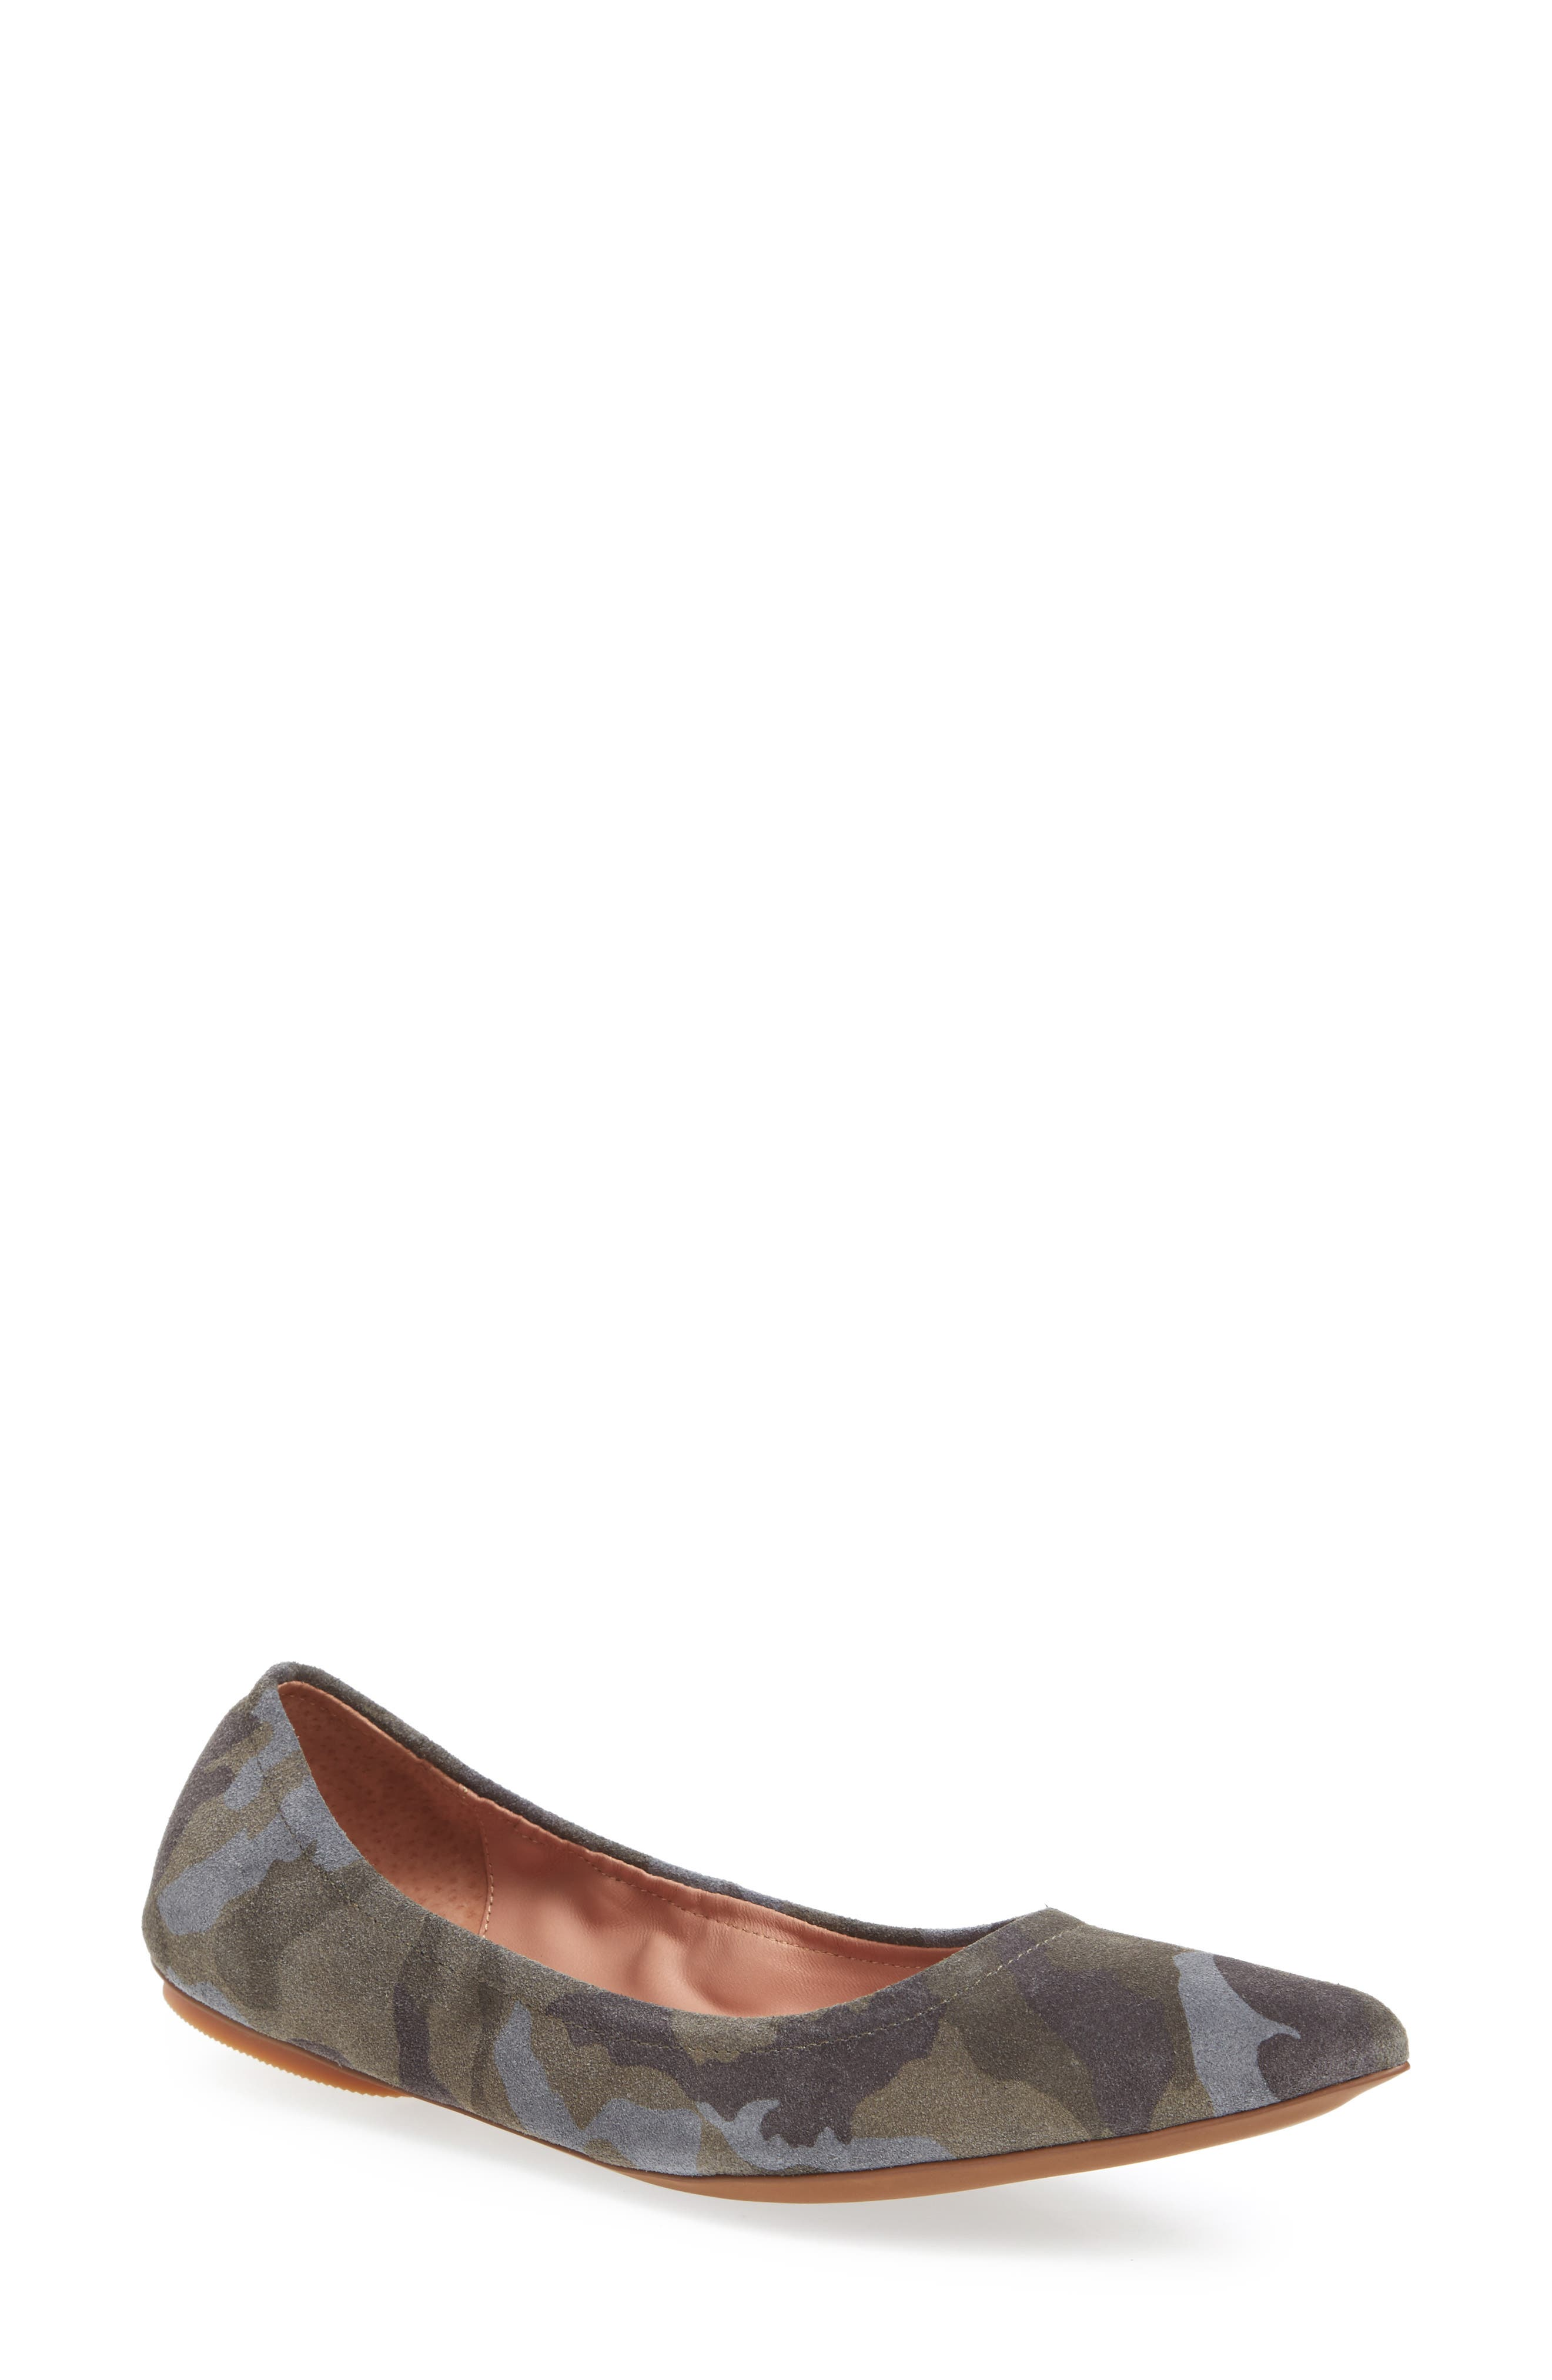 Alternate Image 1 Selected - Linea Paolo Nico Pointy Toe Flat (Women)